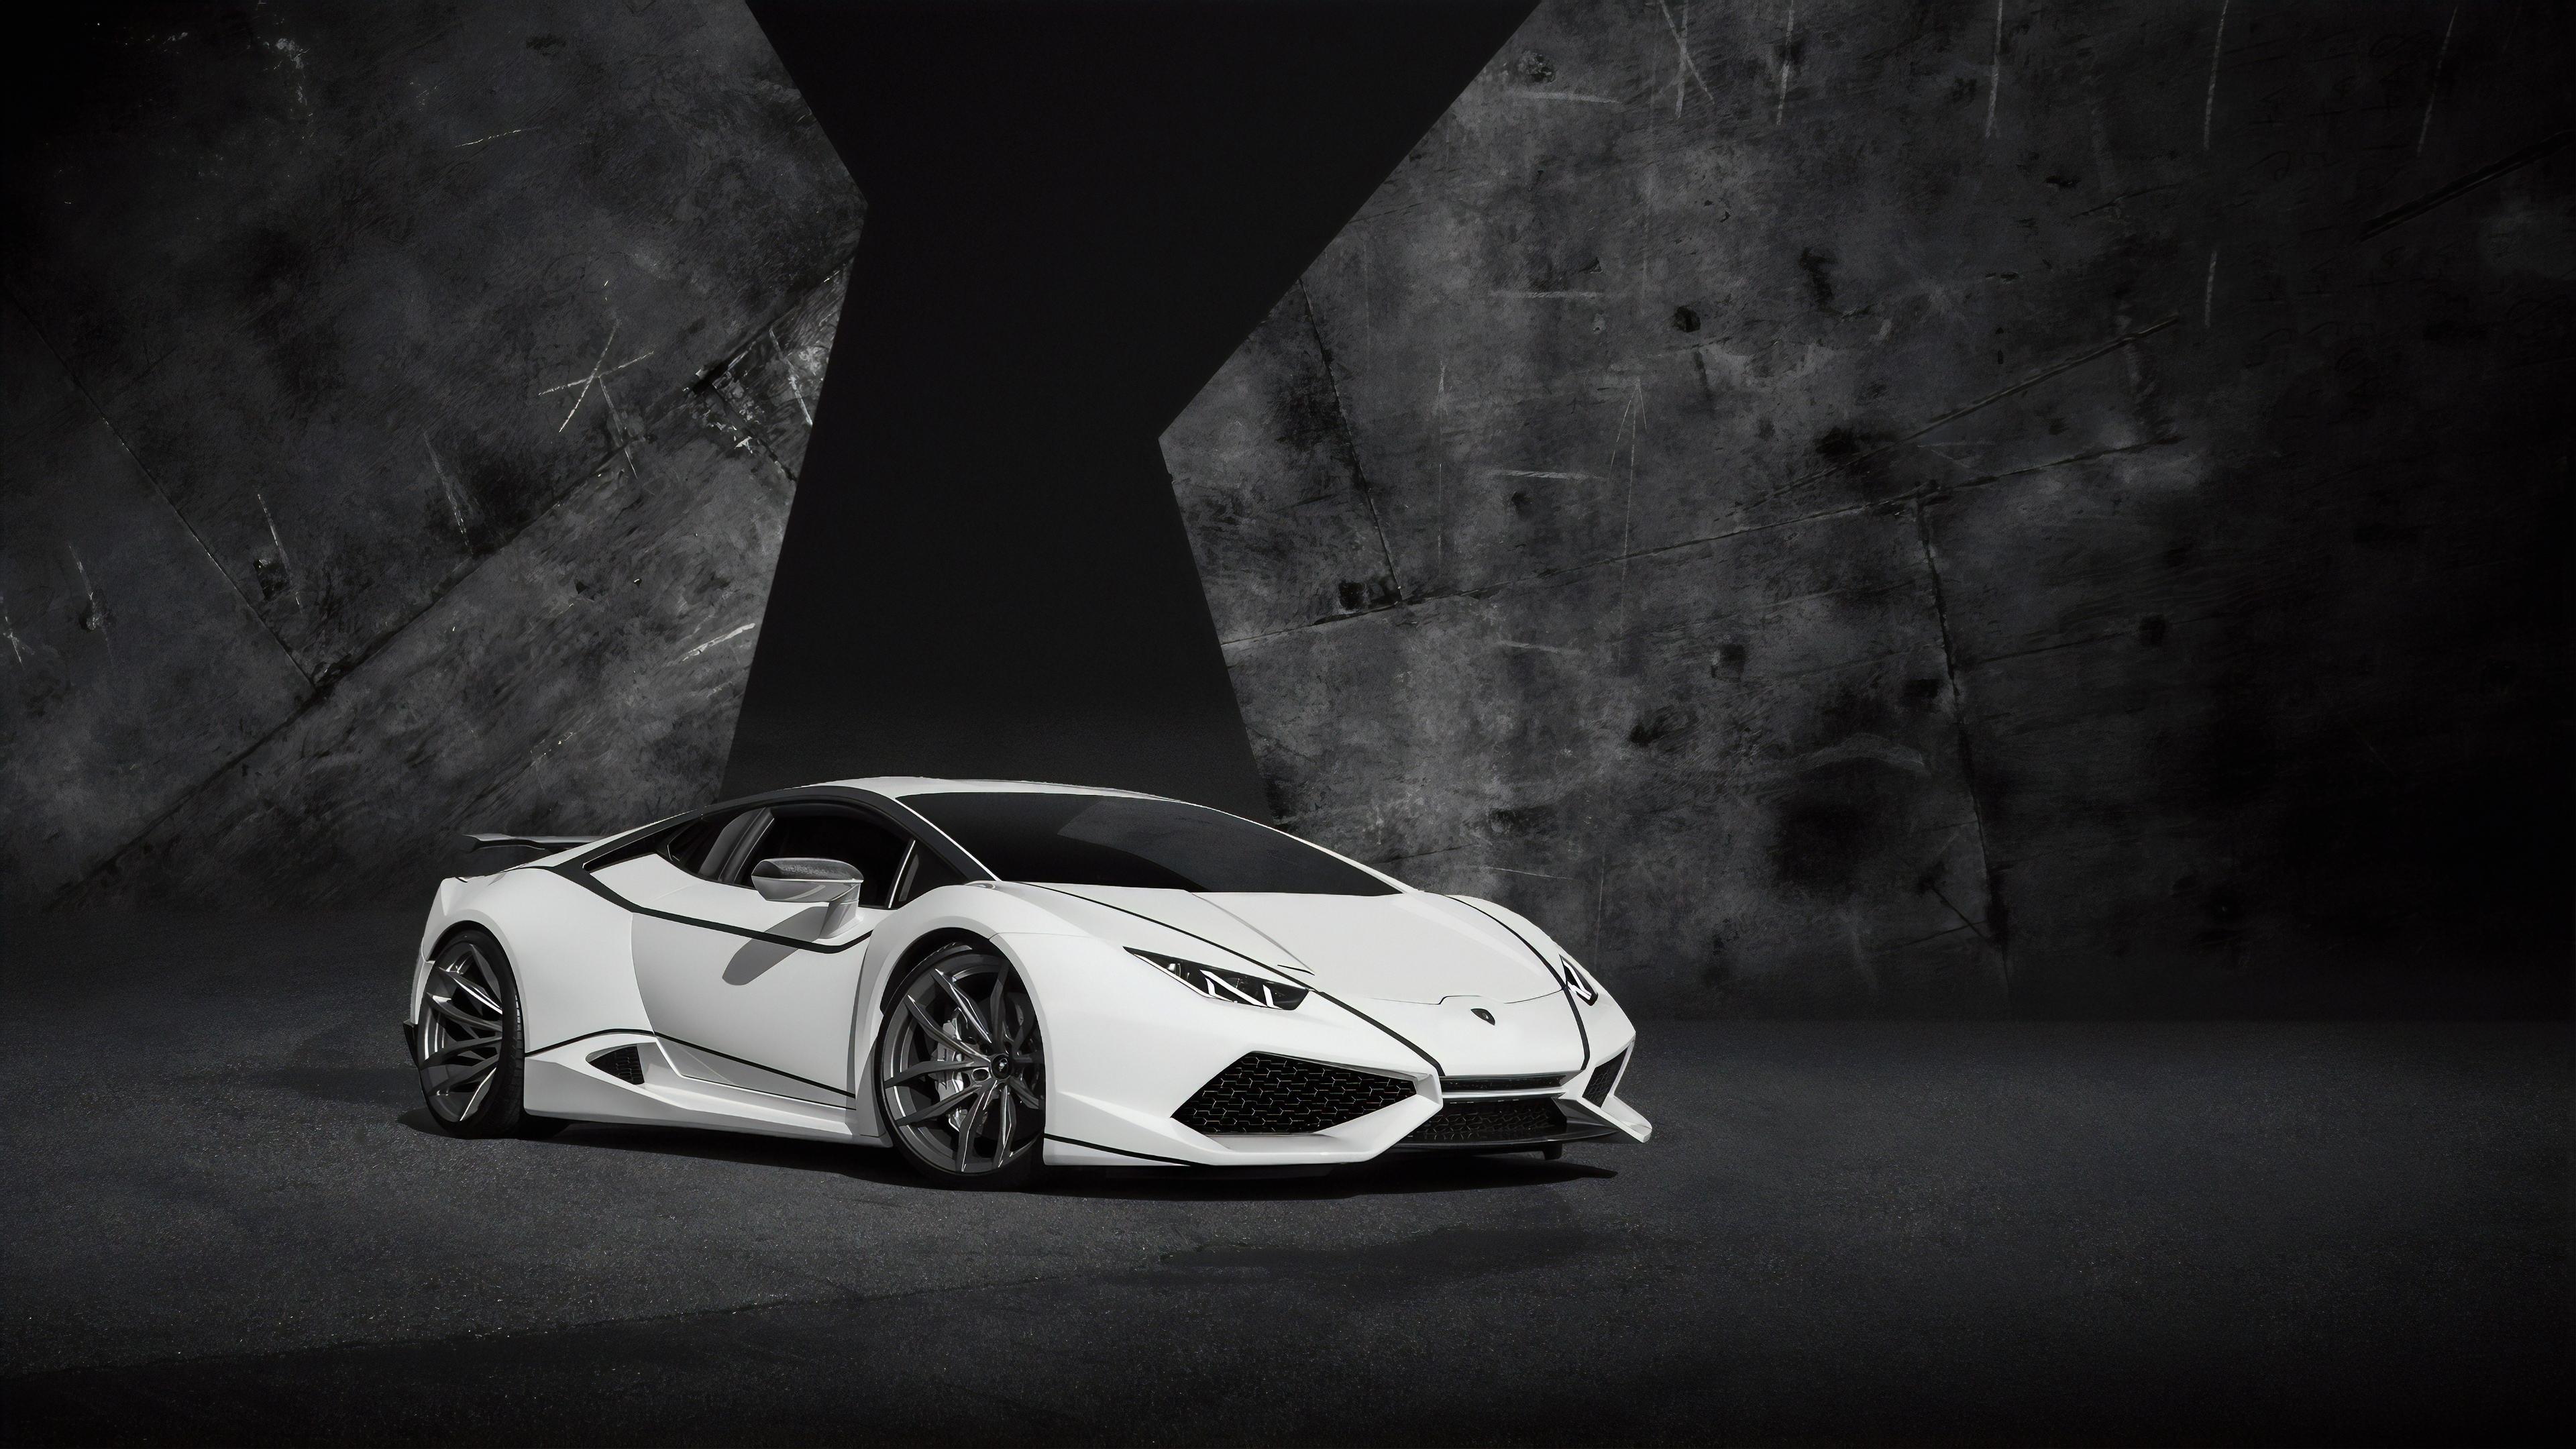 Wallpaper 4k Lamborghini Aventador